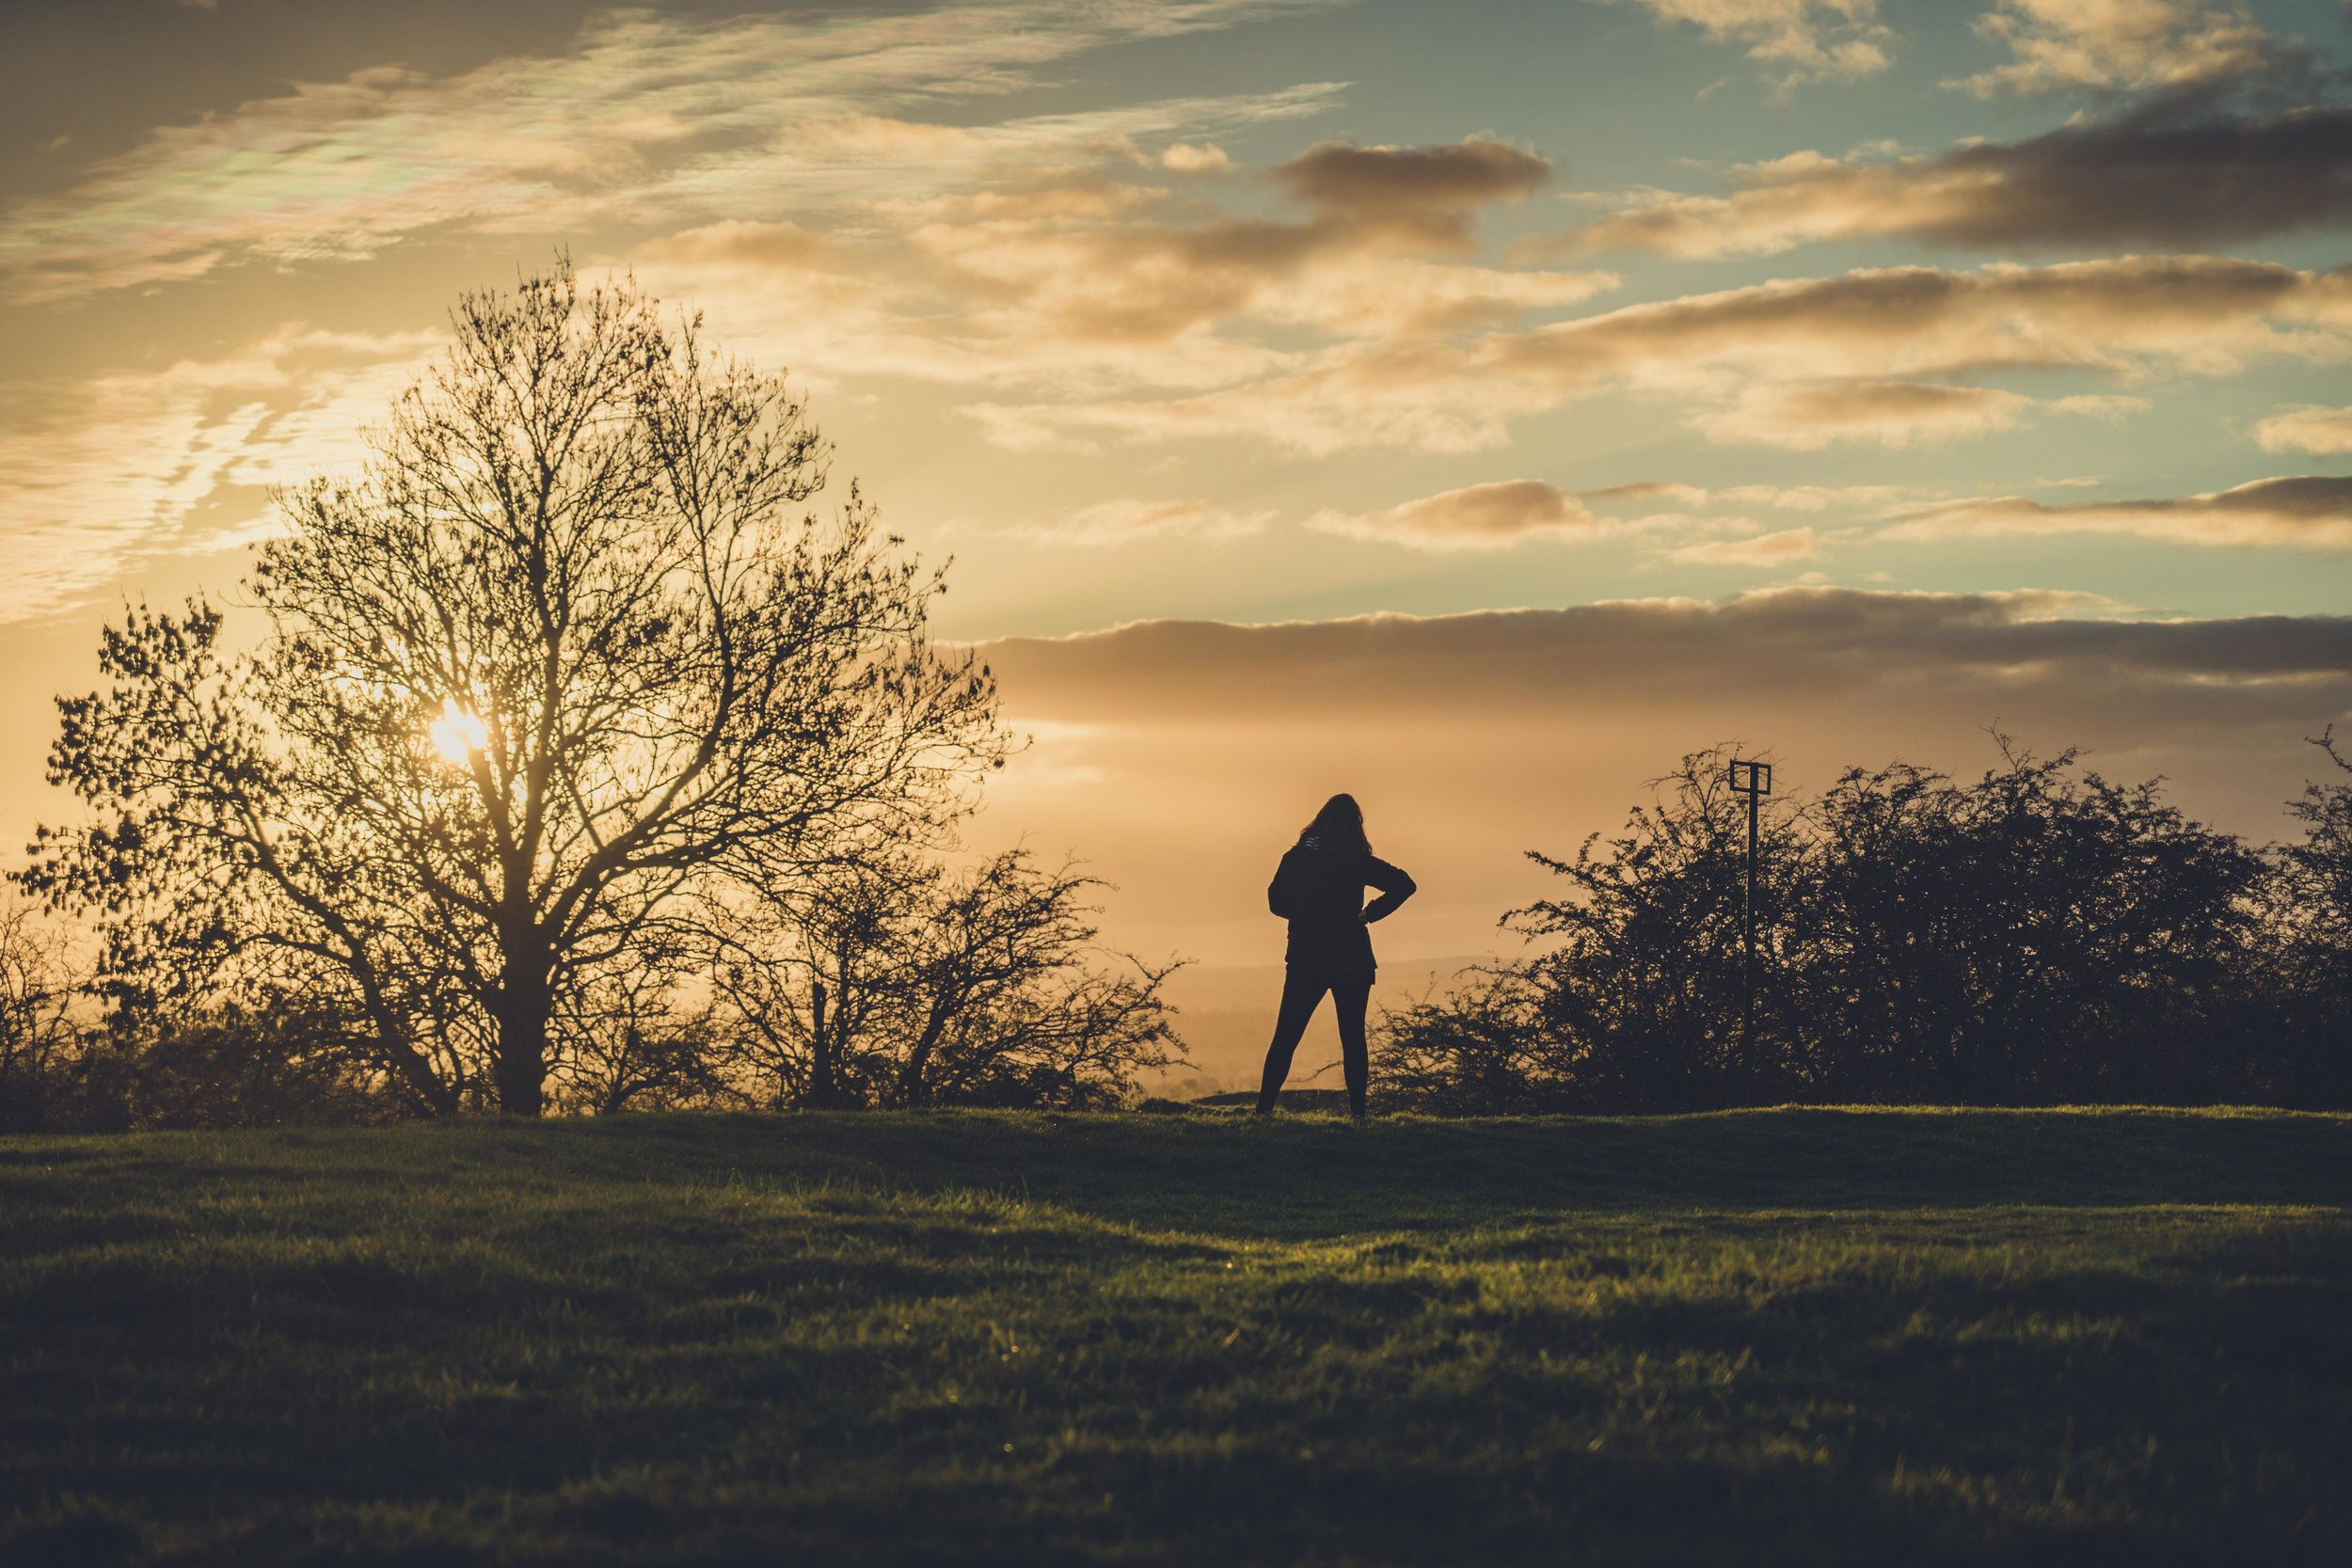 Hill of tara. ireland. history. irish. golden light. travel. blog. autumn. colour. celtic. gaelic. standing in golden light. sunset.jpg